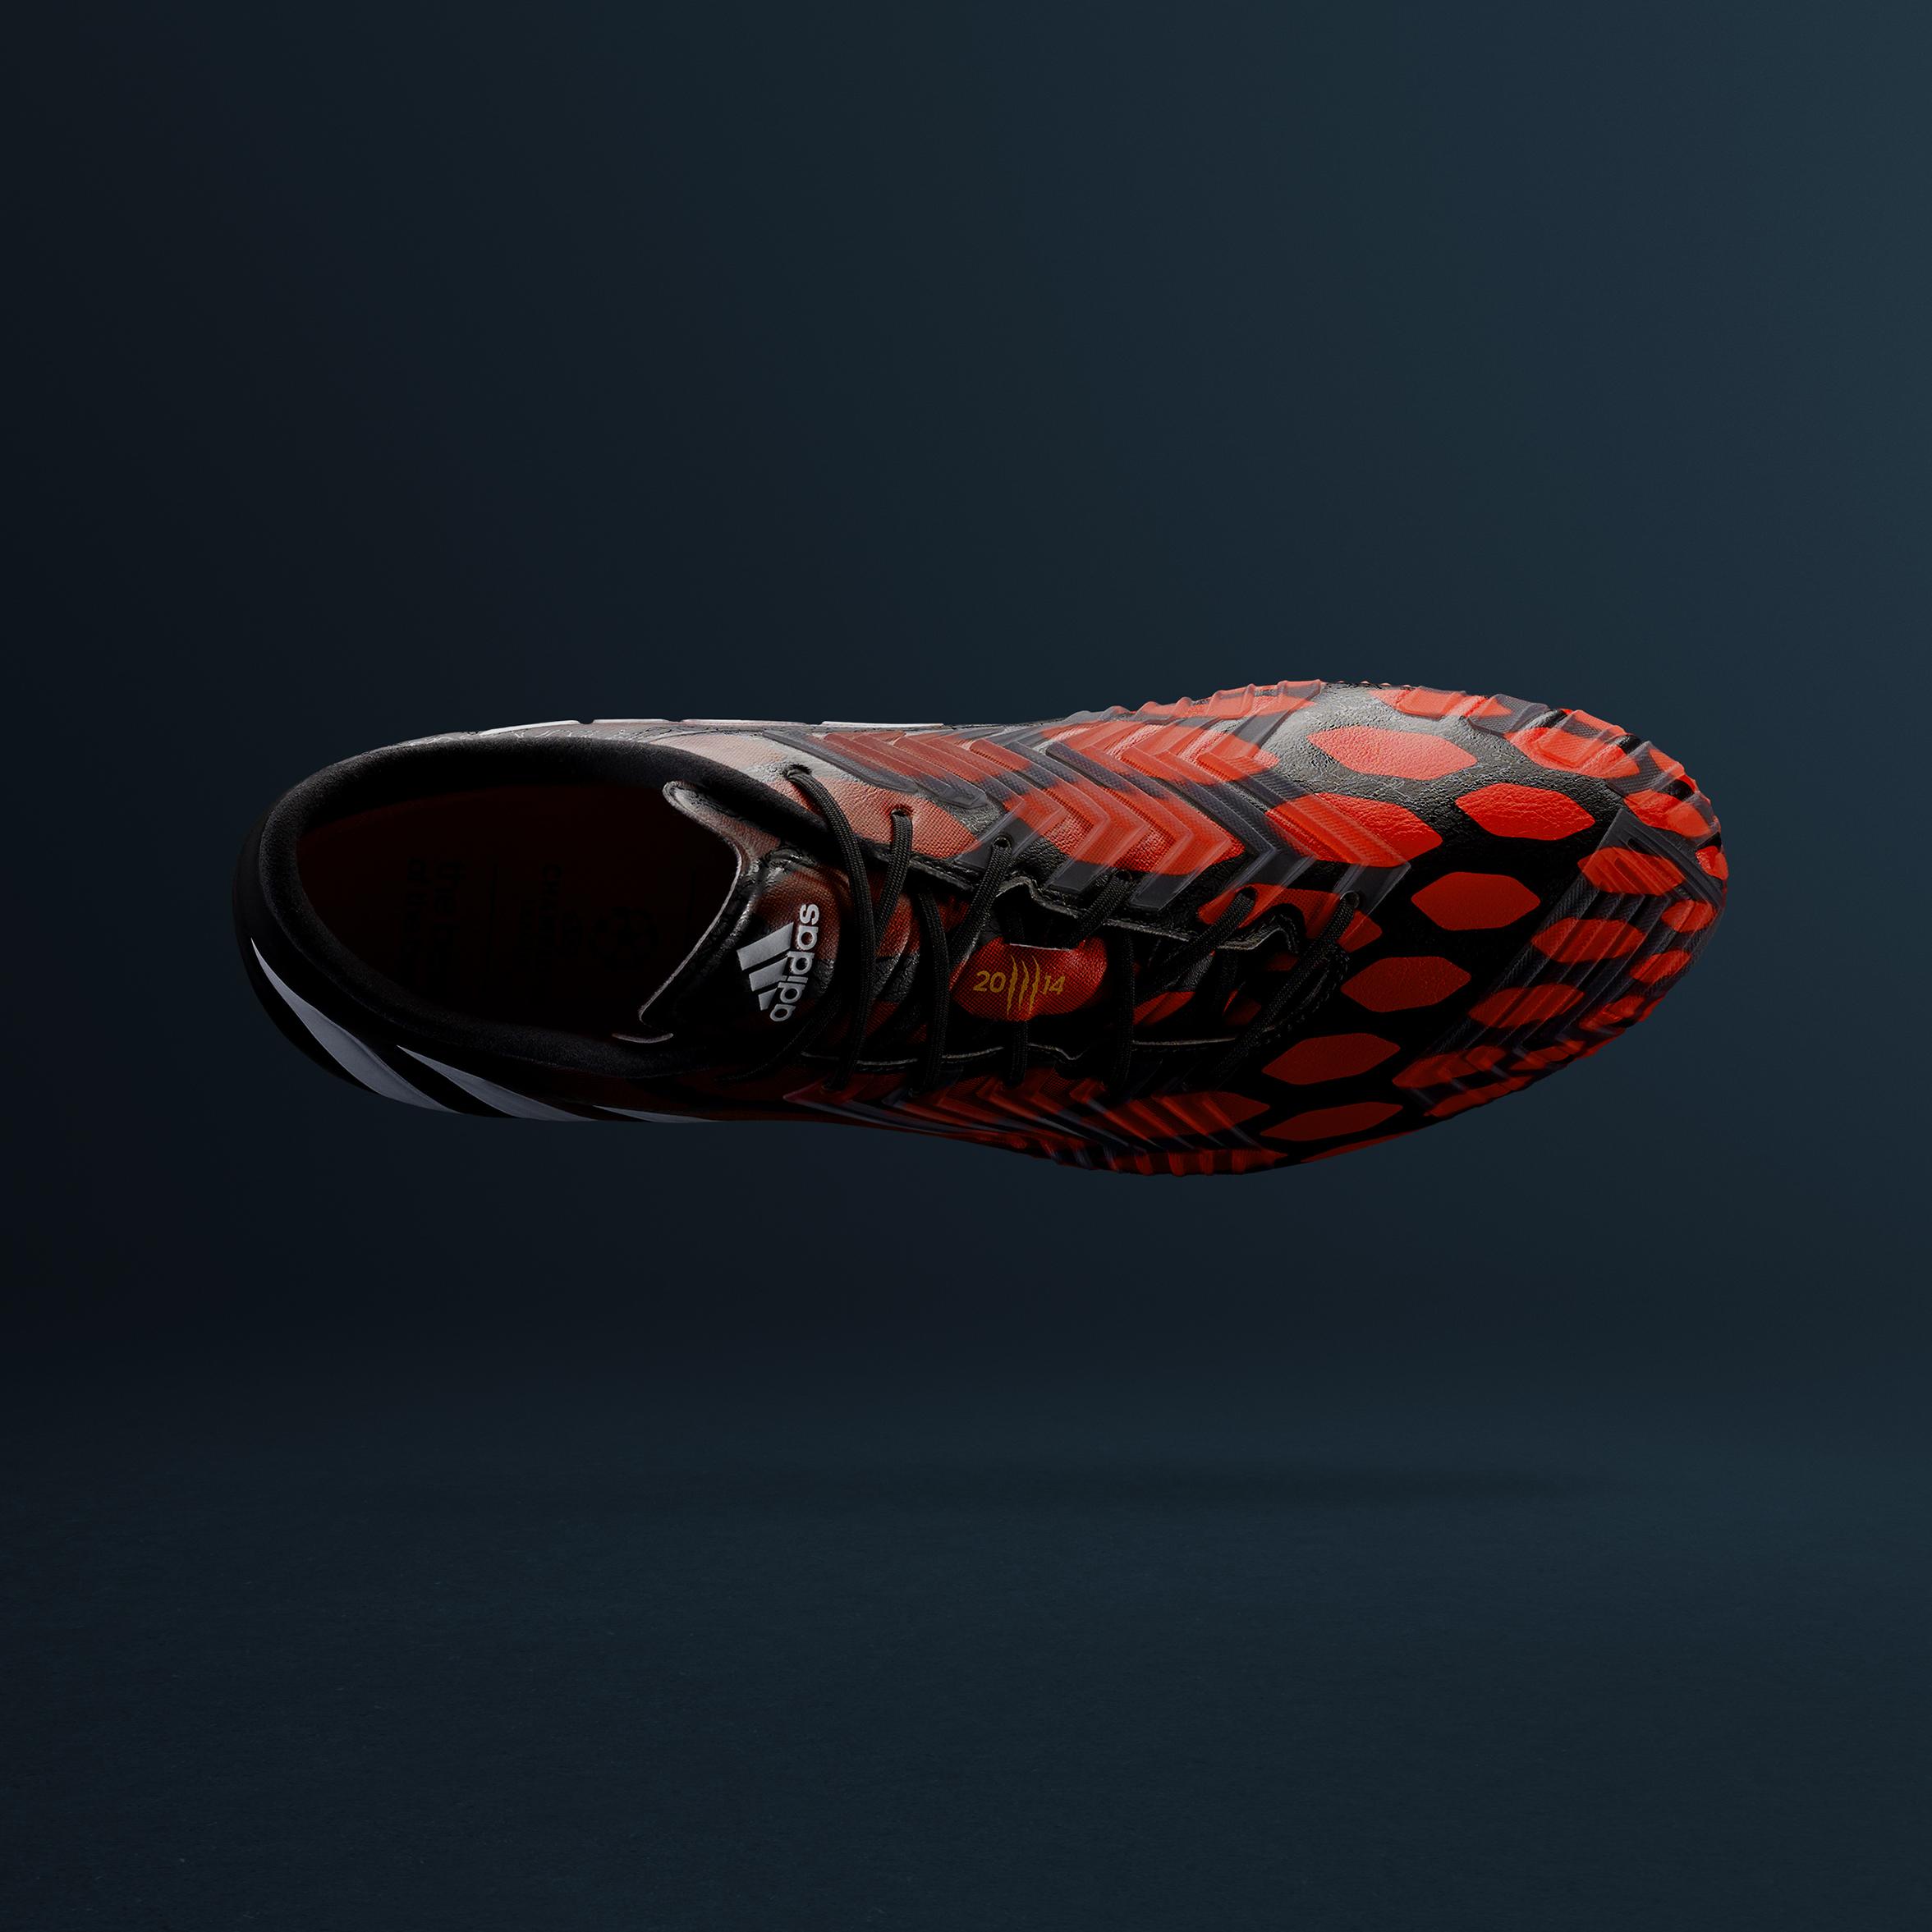 Adidas_Predator_Instinct2